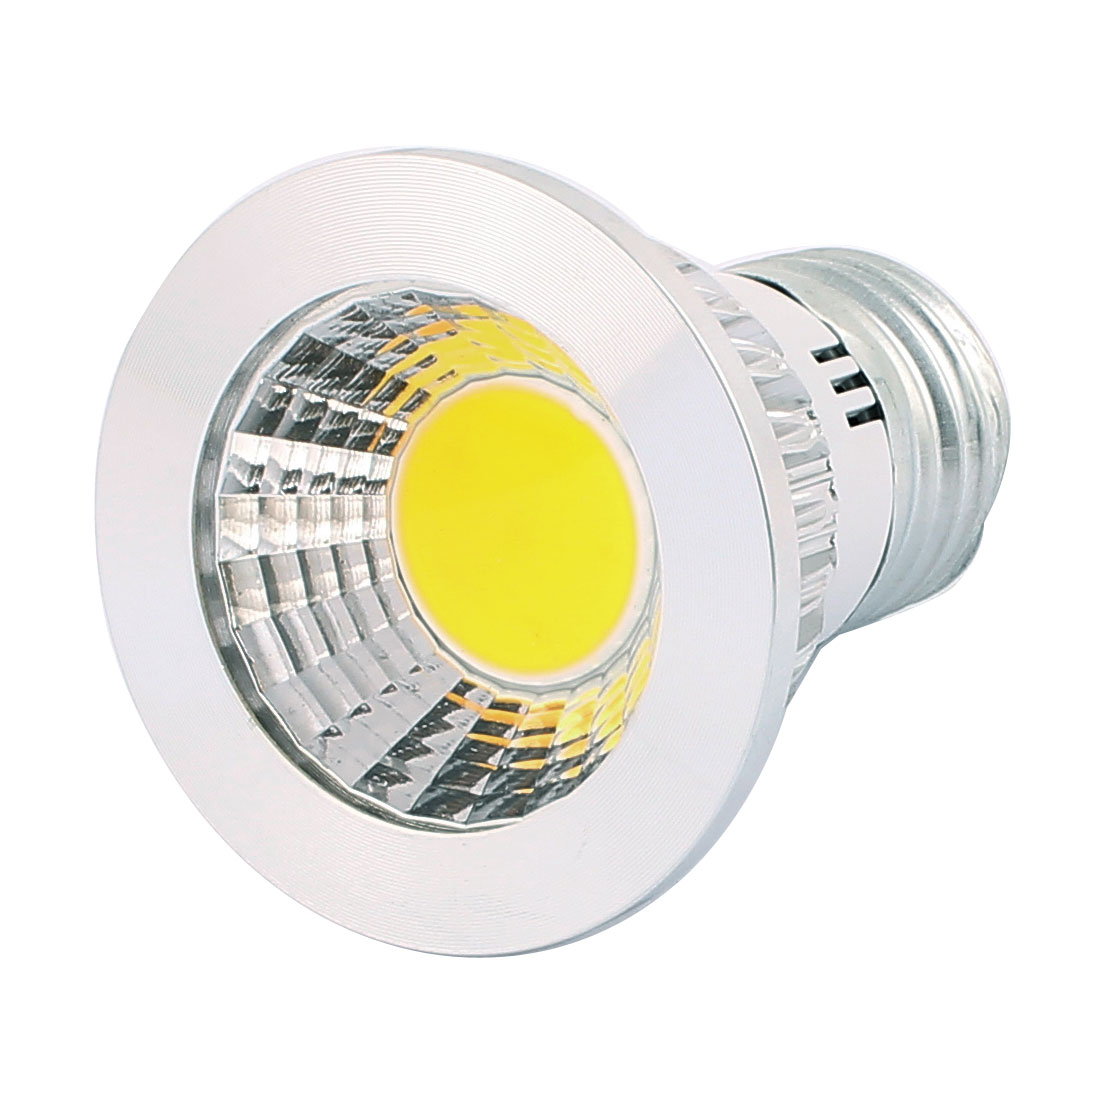 AC85-265V-3W-Power-E27-COB-LED-Spot-Down-Light-Lamp-Energy-Saving-Pure-White